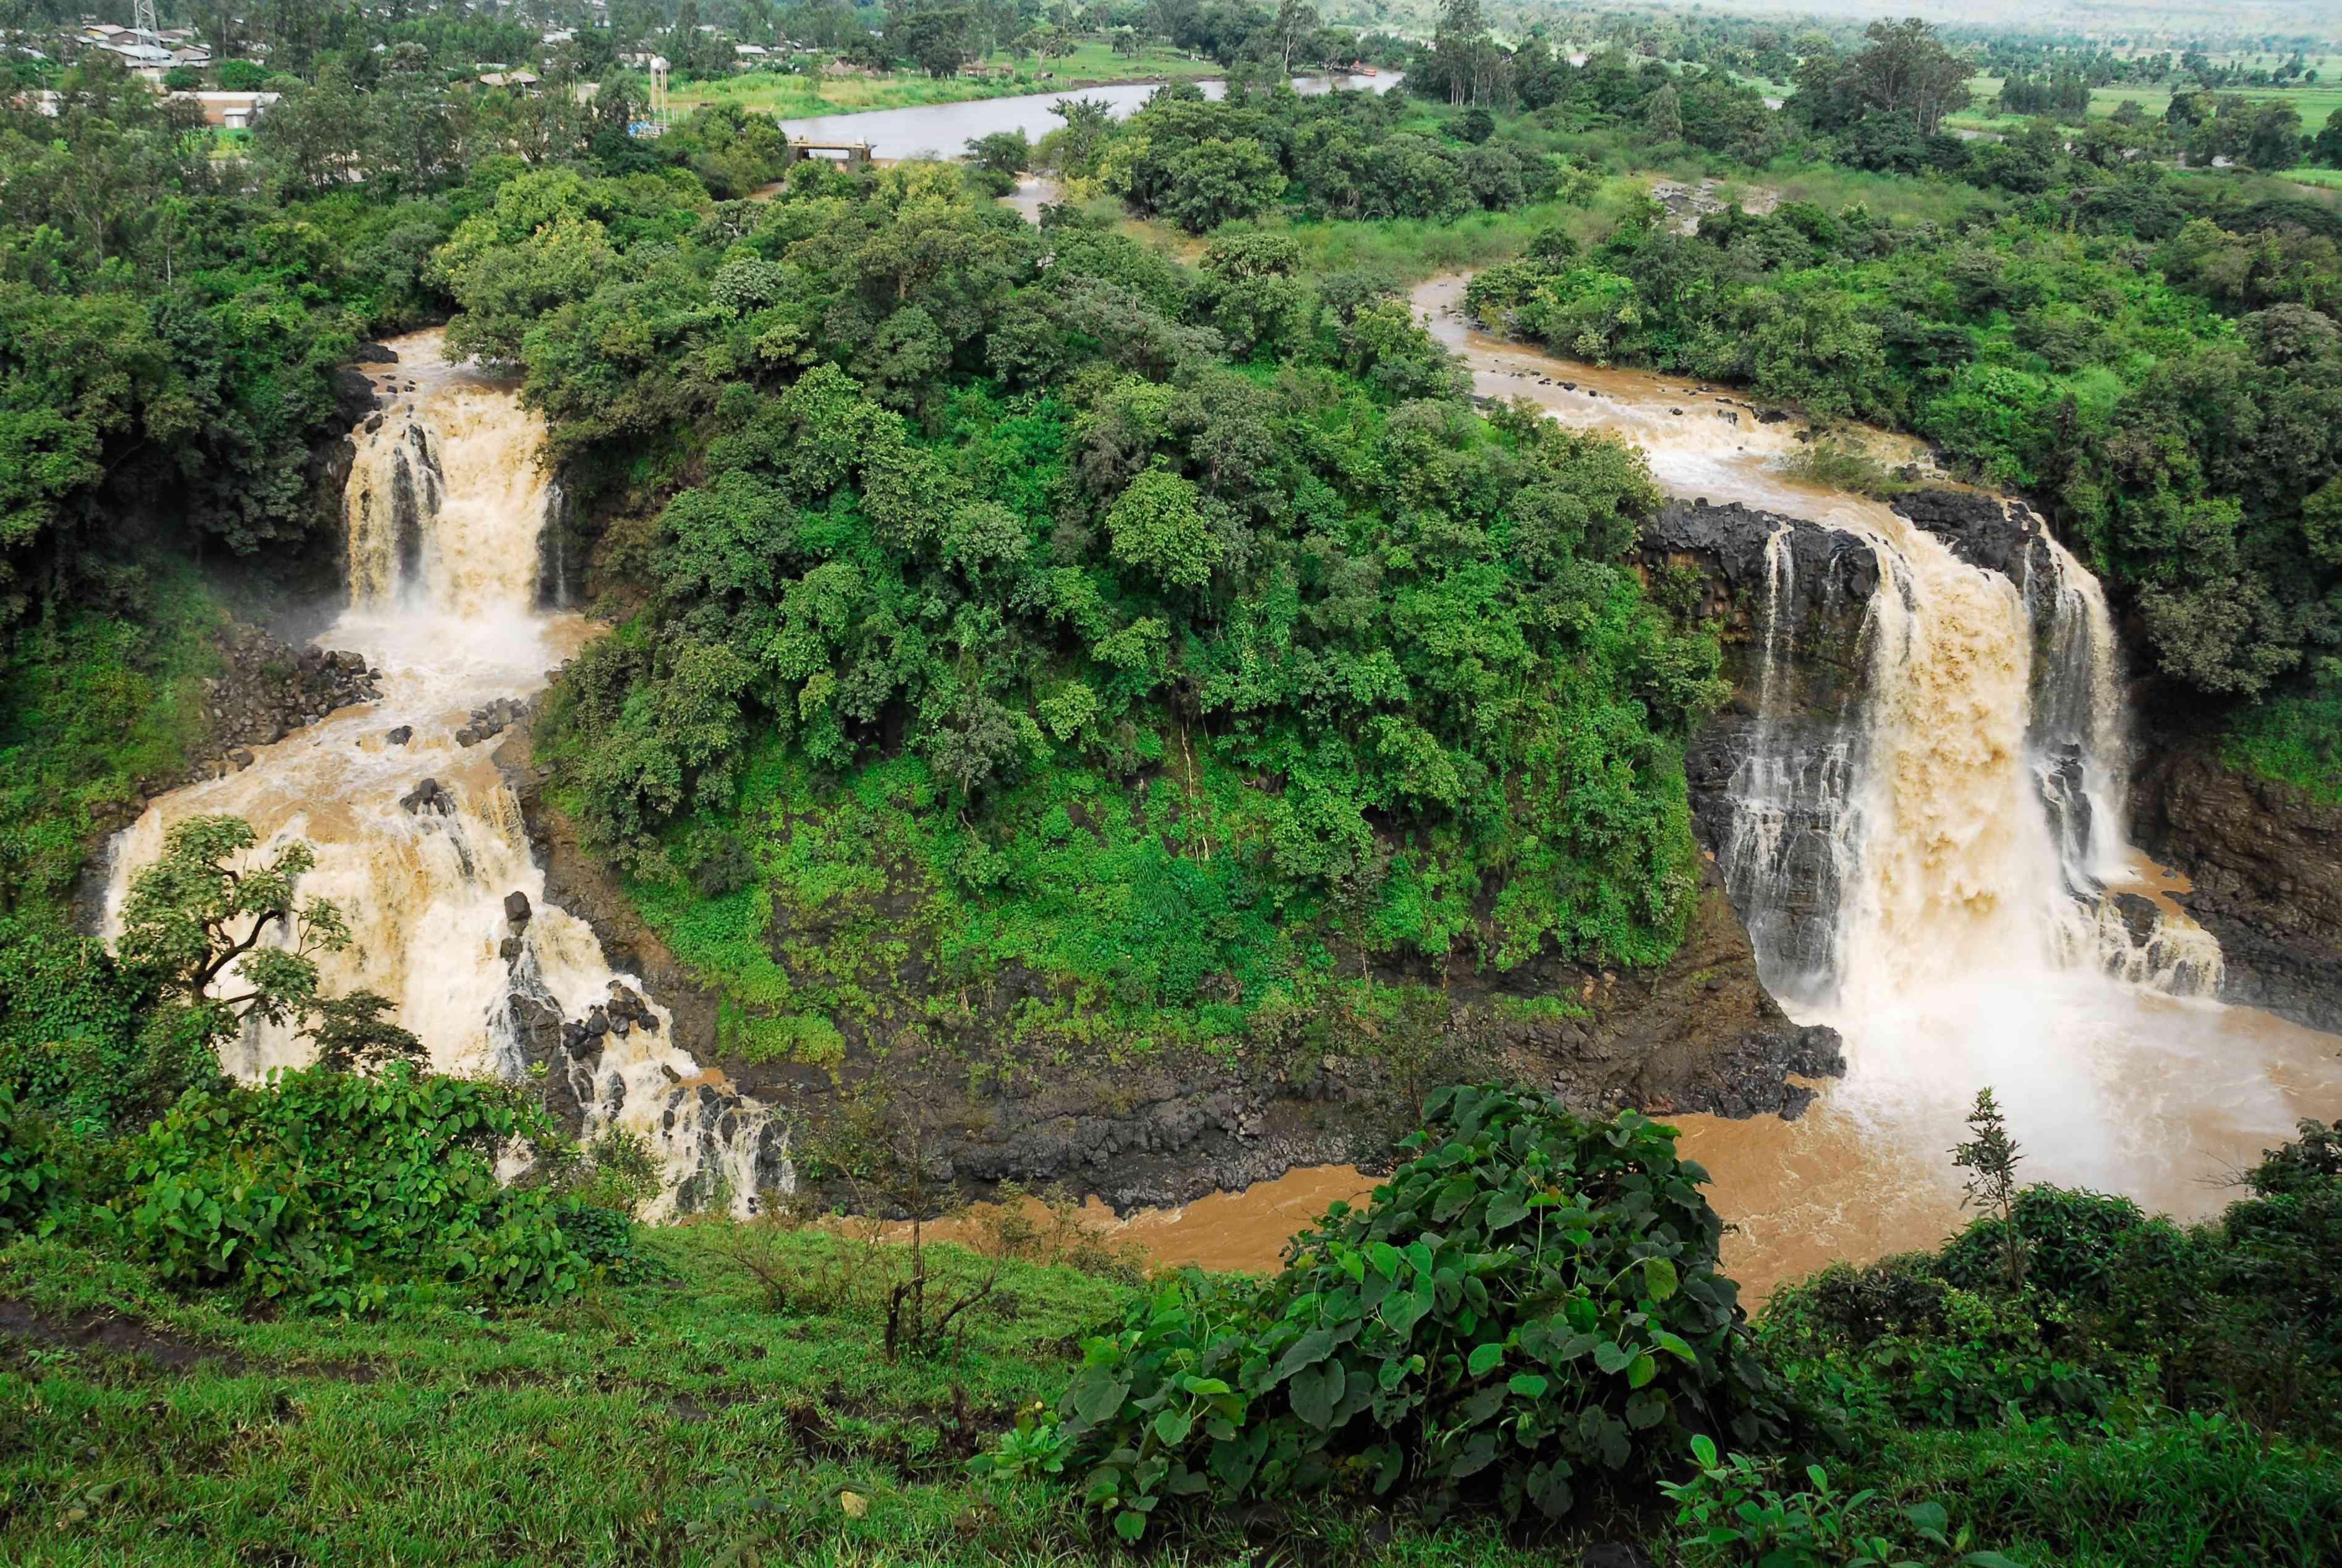 Tis Abay, or Blue Nile Falls, in Ethiopia